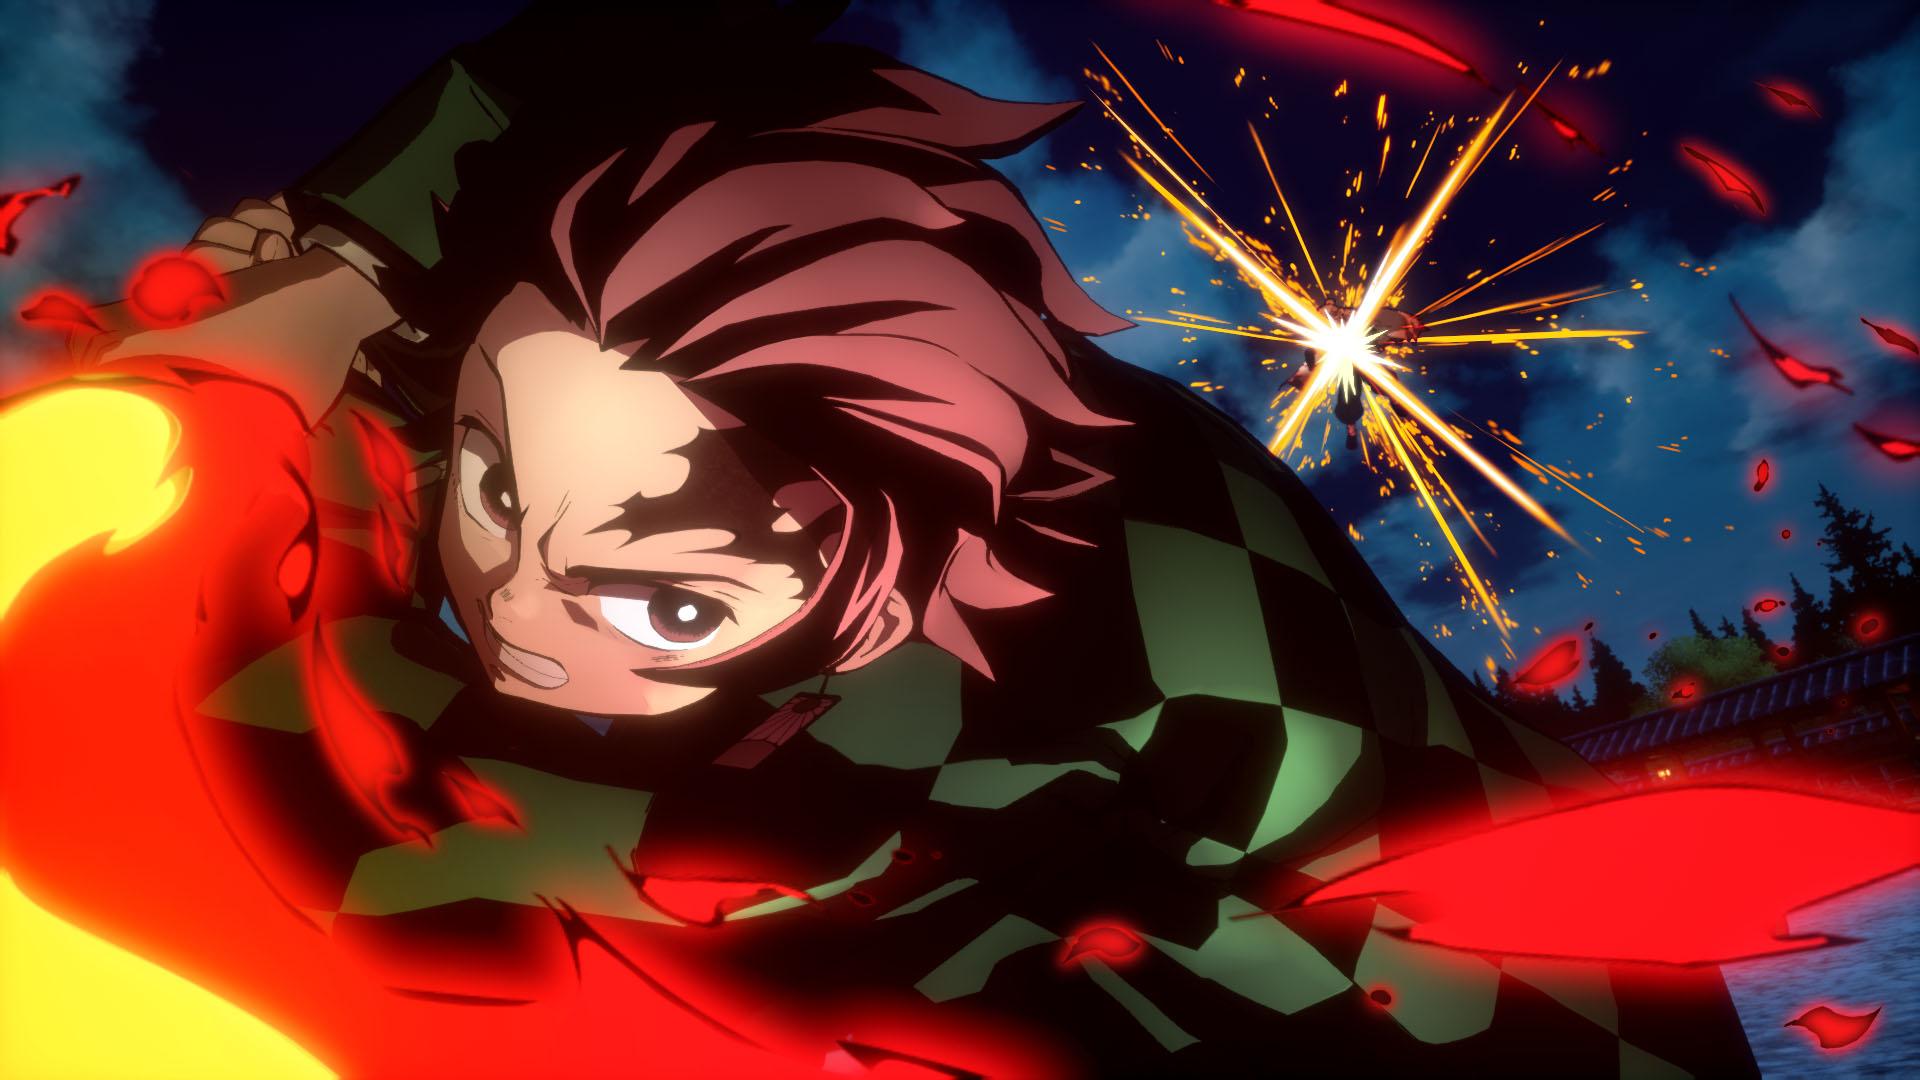 Tanjiro Kamado slashes through a foe in Demon Slayer: Kimetsu no Yaiba - The Hinokami Chronicles